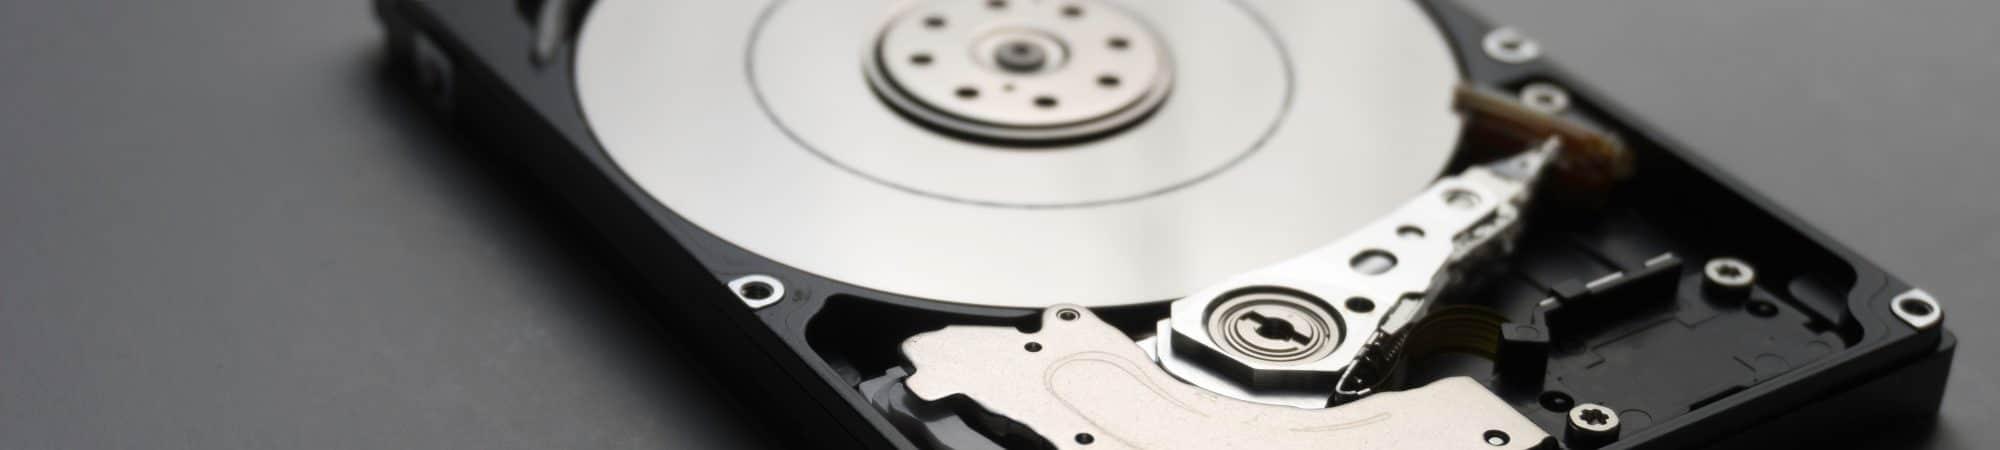 hard drive, hd, disco rígido